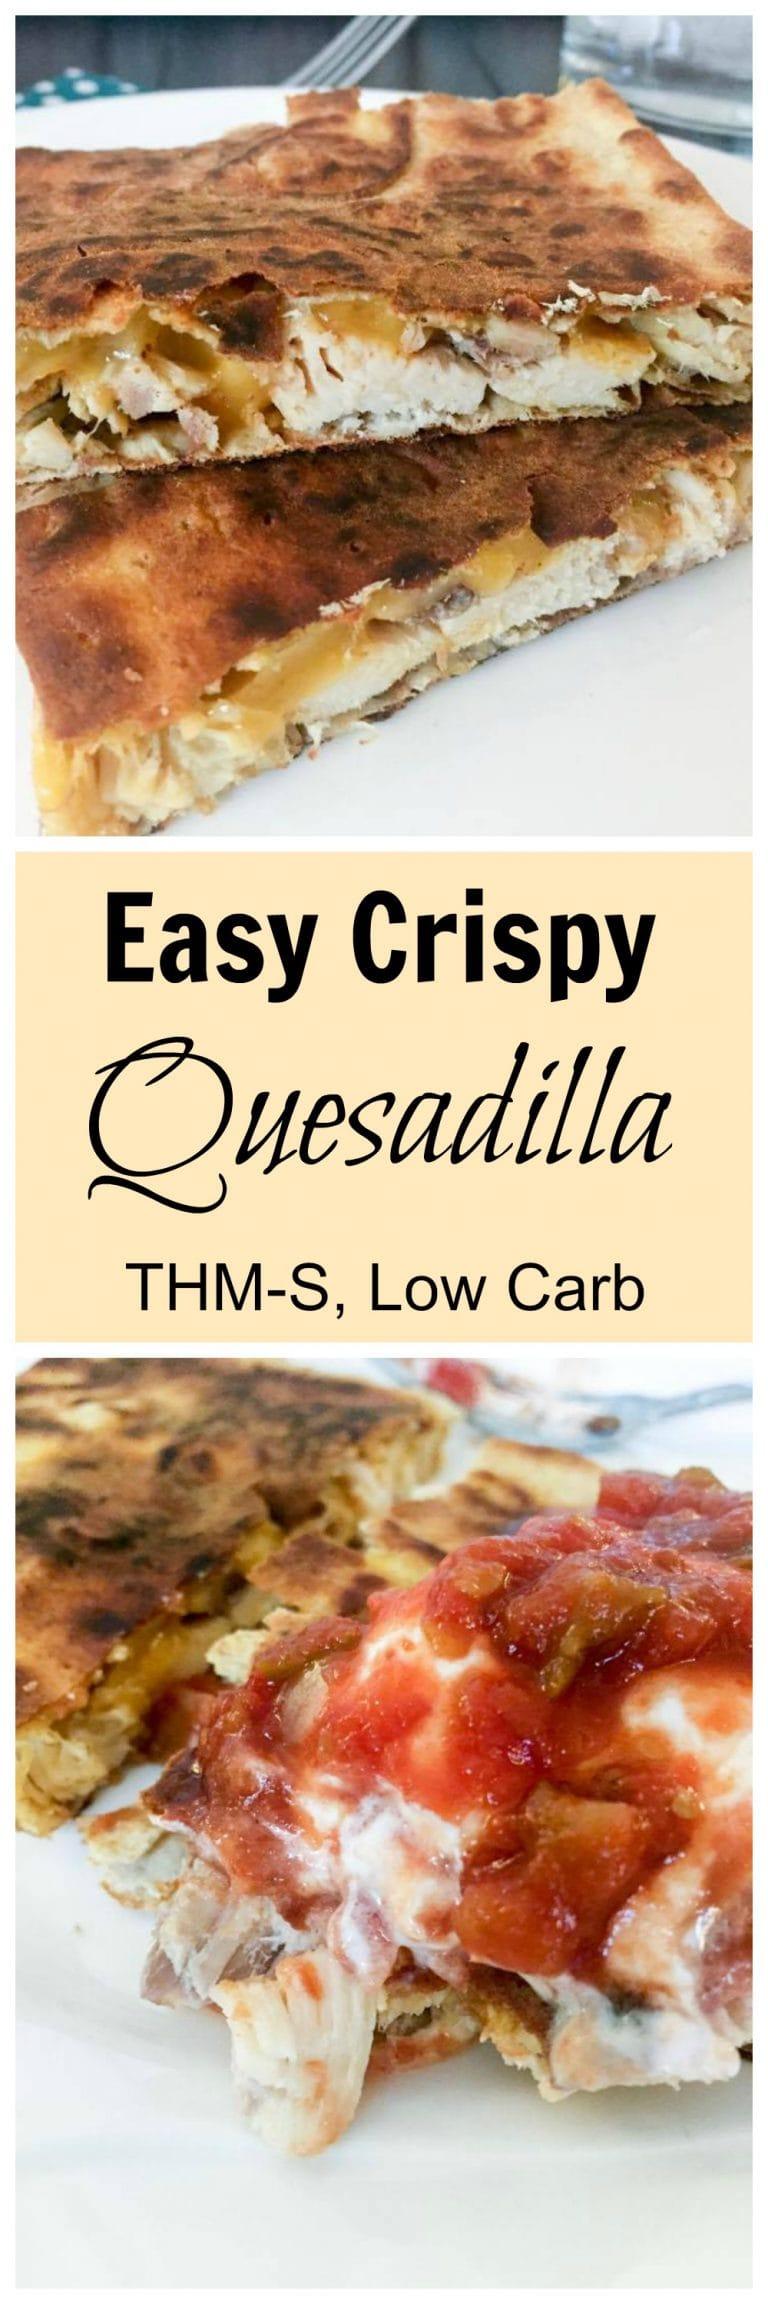 Easy Crispy Quesadilla (THM-S, Low Carb)